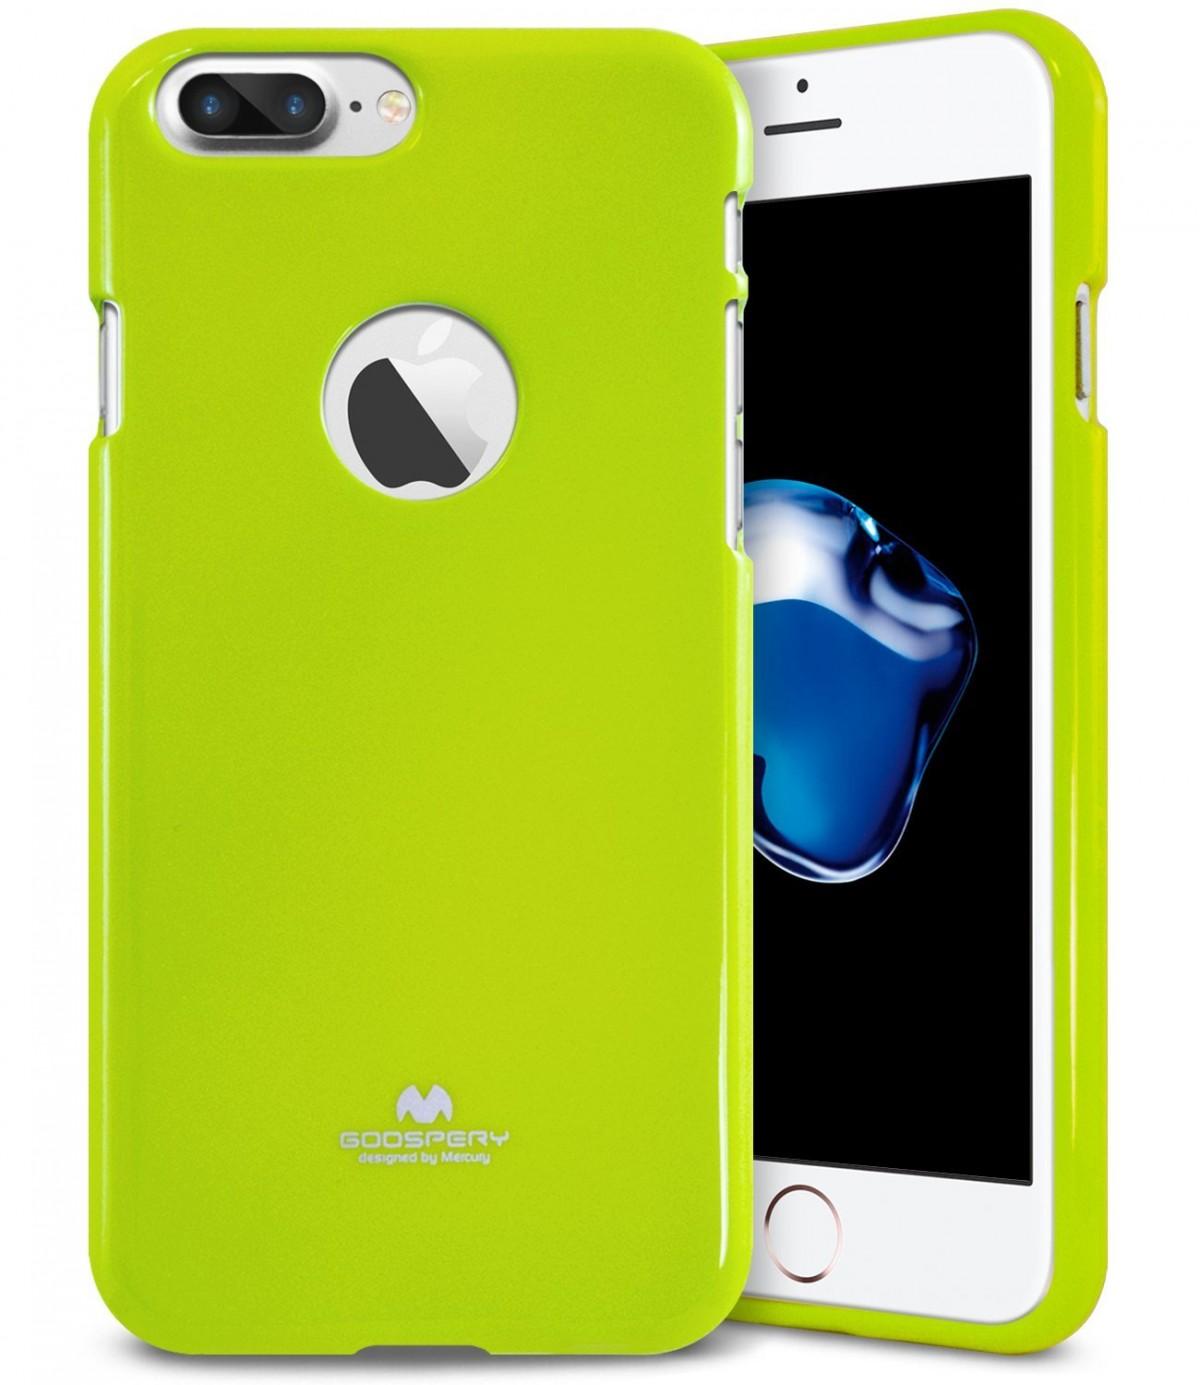 Pouzdro Goospery Mercury Jelly Case Apple iPhone 8 Plus / 7 Plus - Limetkově zelené / Lime